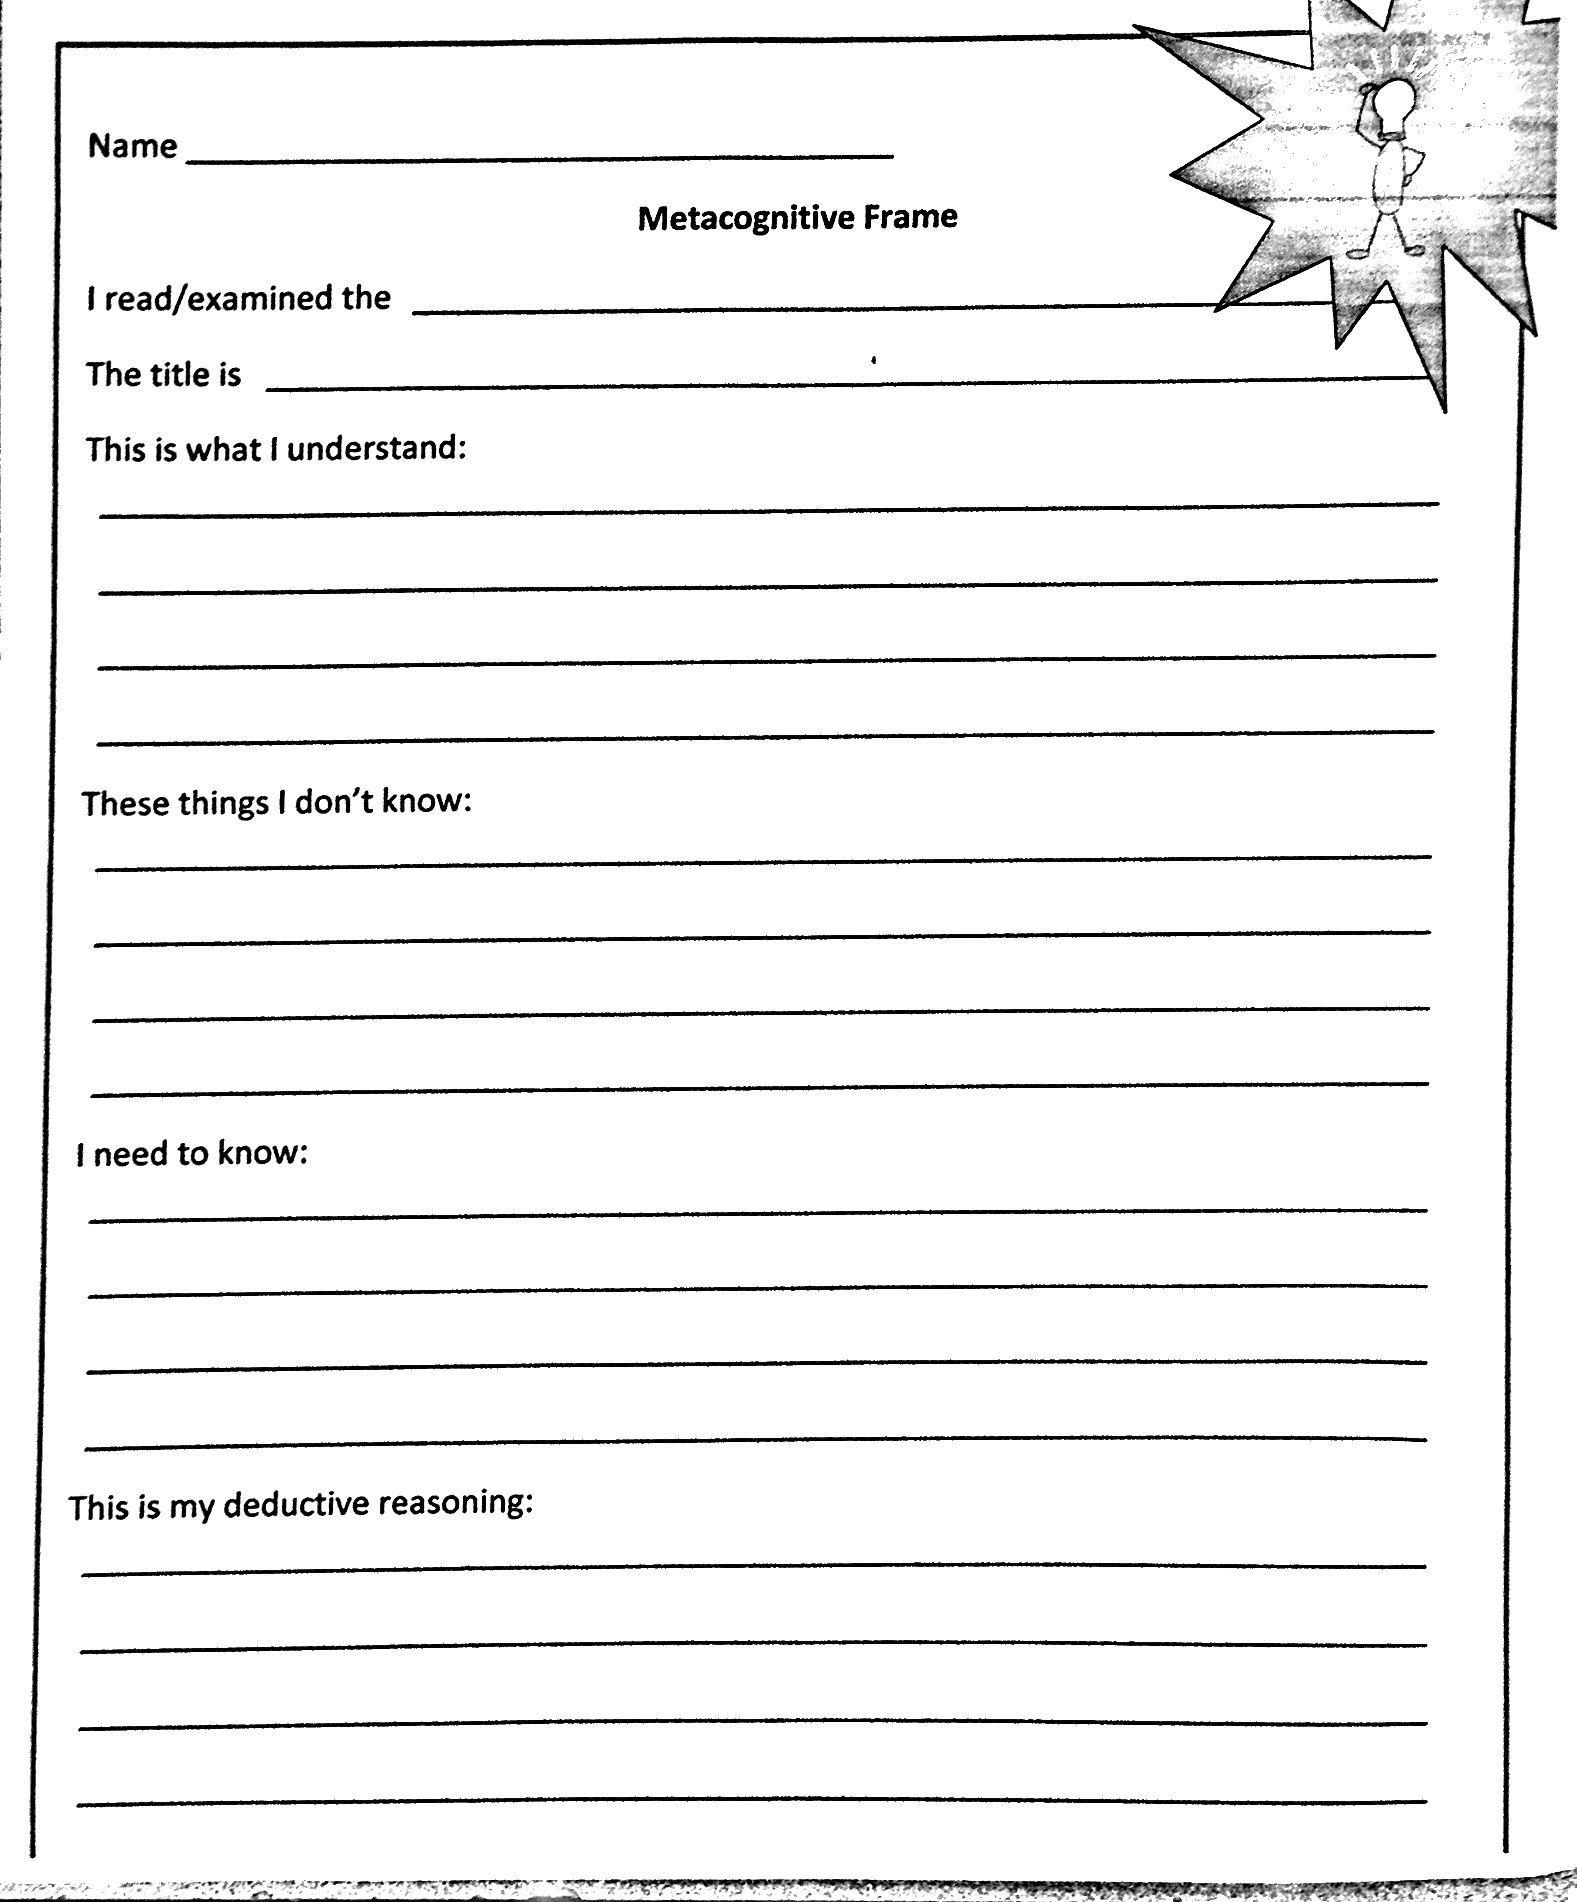 Cardinal Directions Worksheet Grade 3